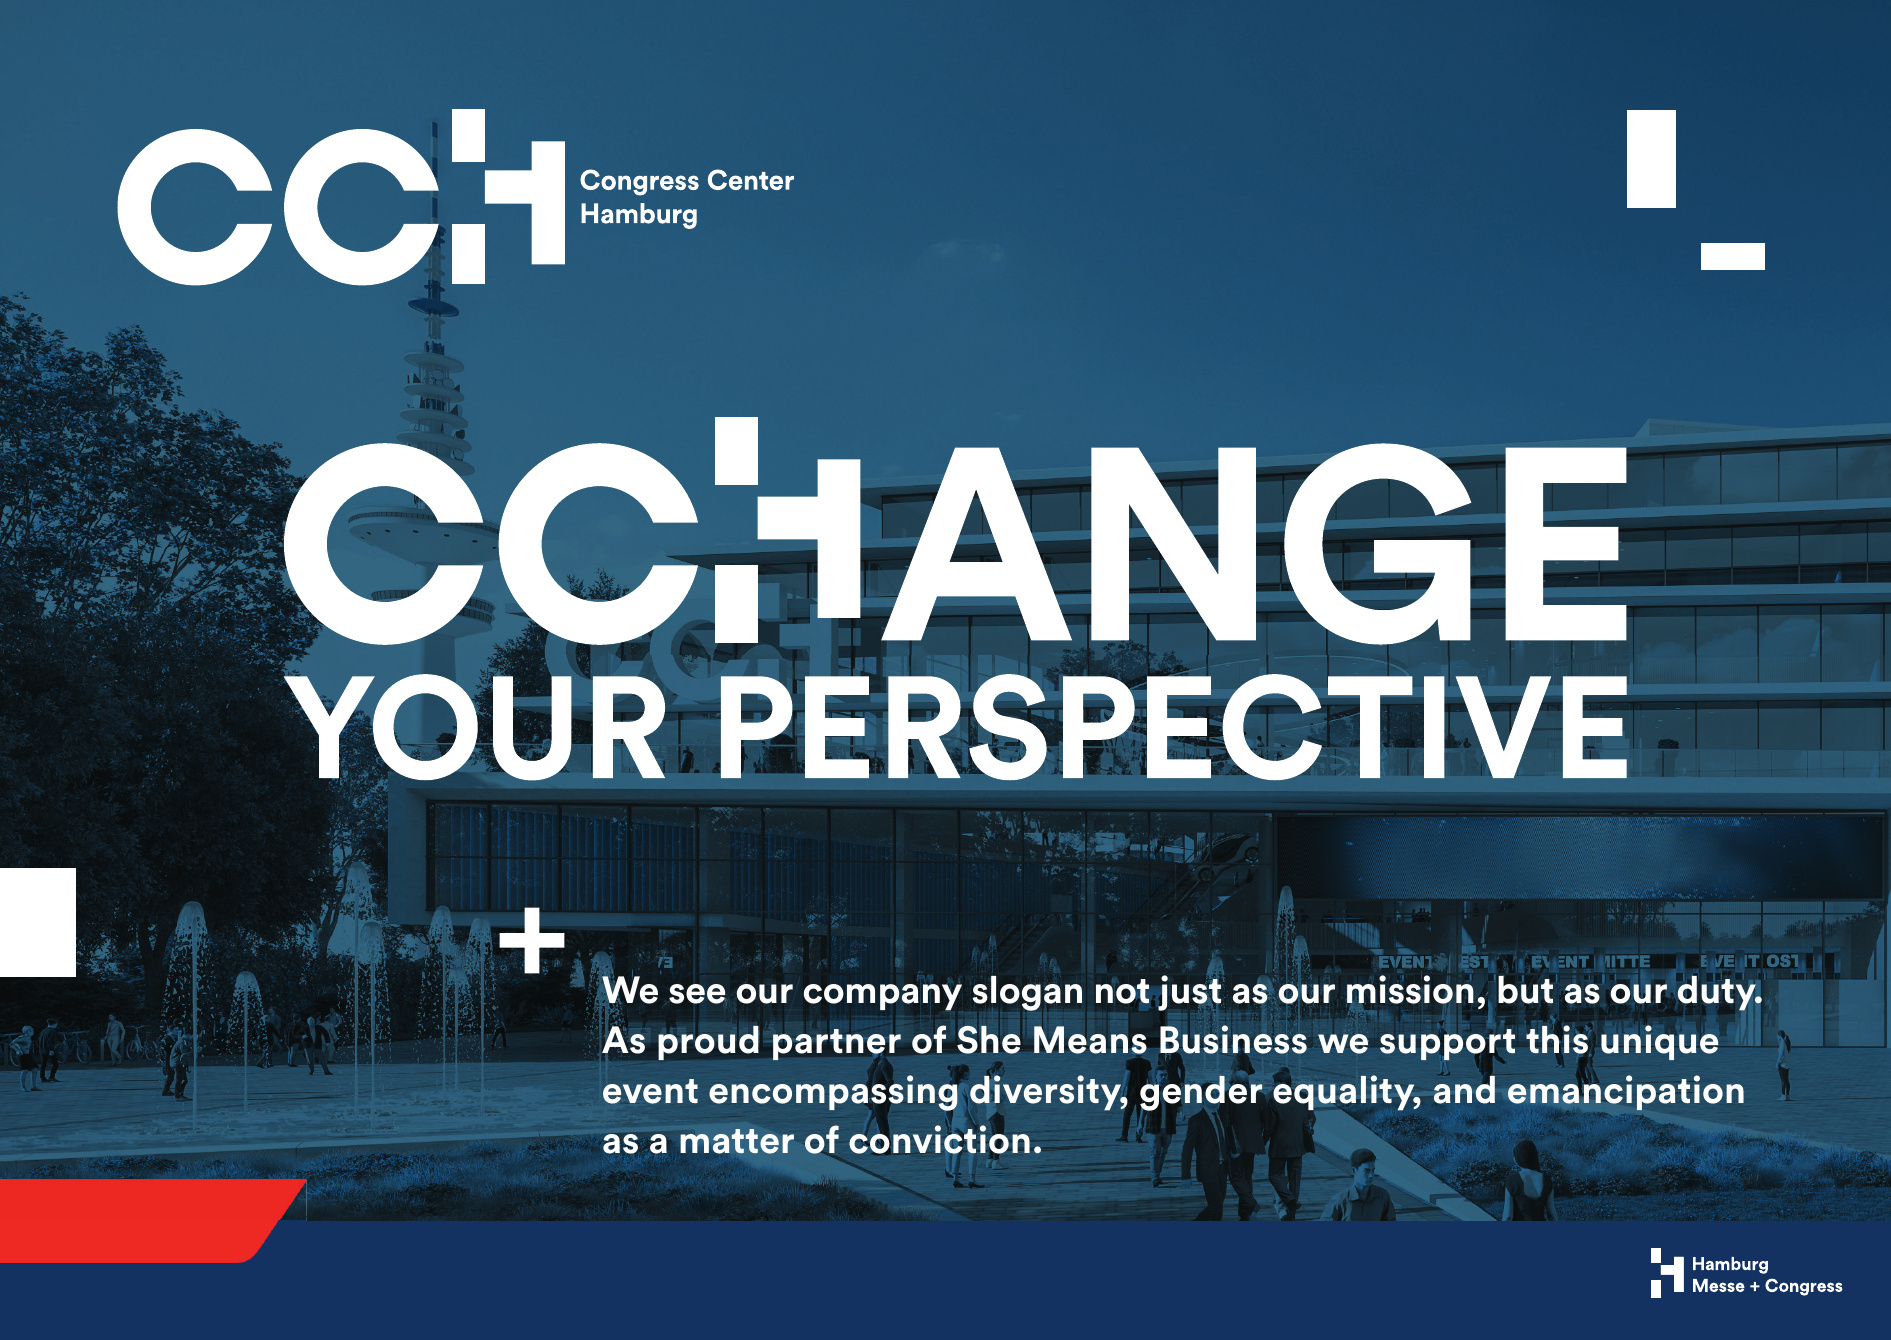 CCH Hamburg